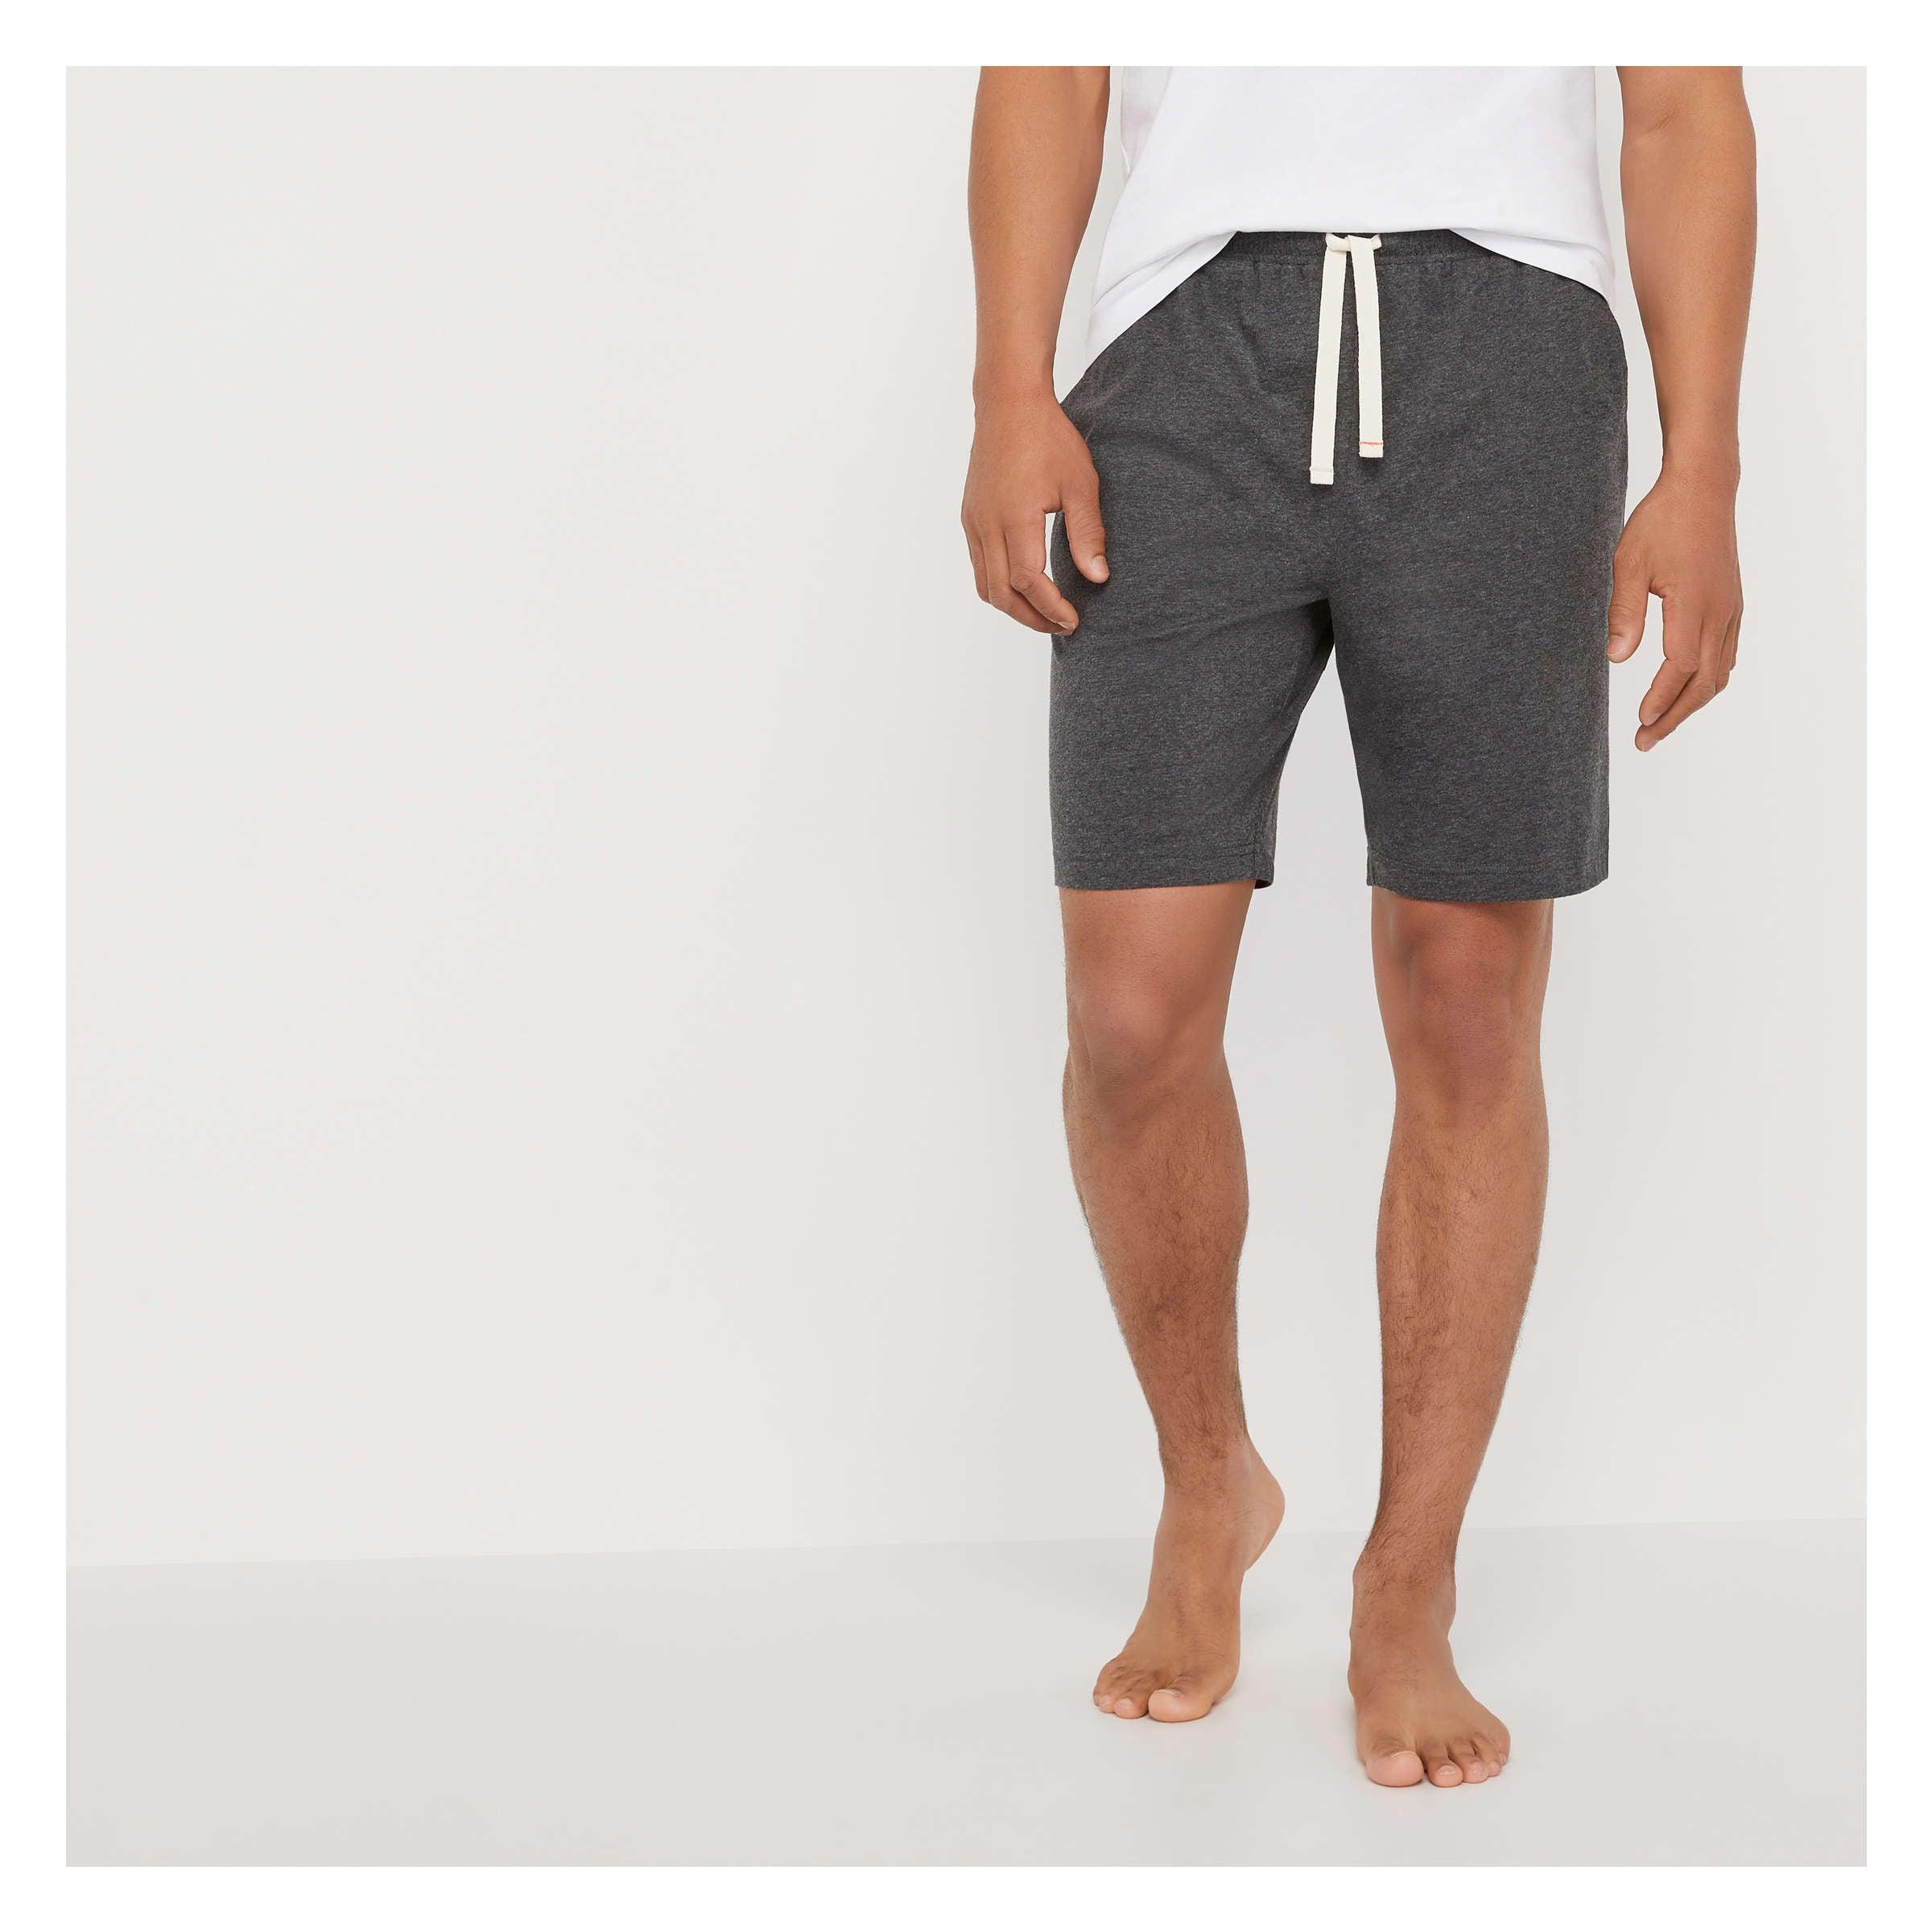 35dbd8e7fab Men's Sleep Shorts in Charcoal Melange from Joe Fresh